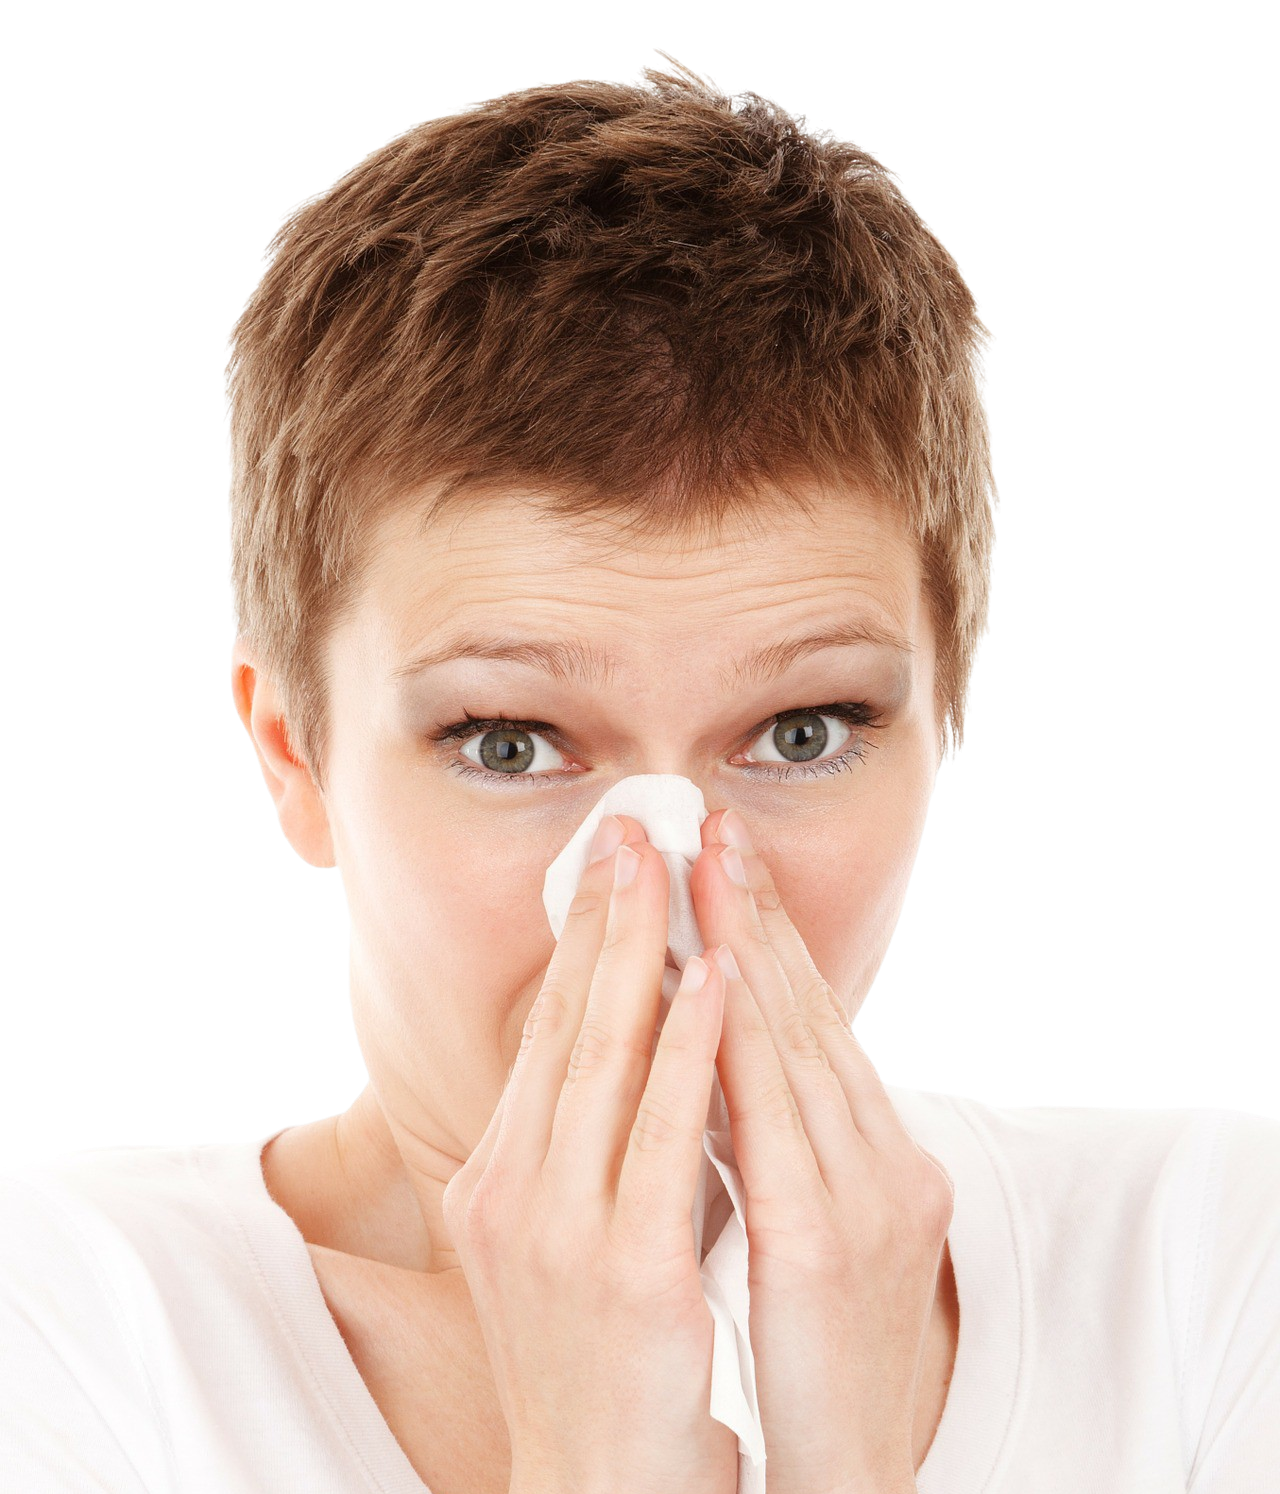 allergy-18656_1920-removebg